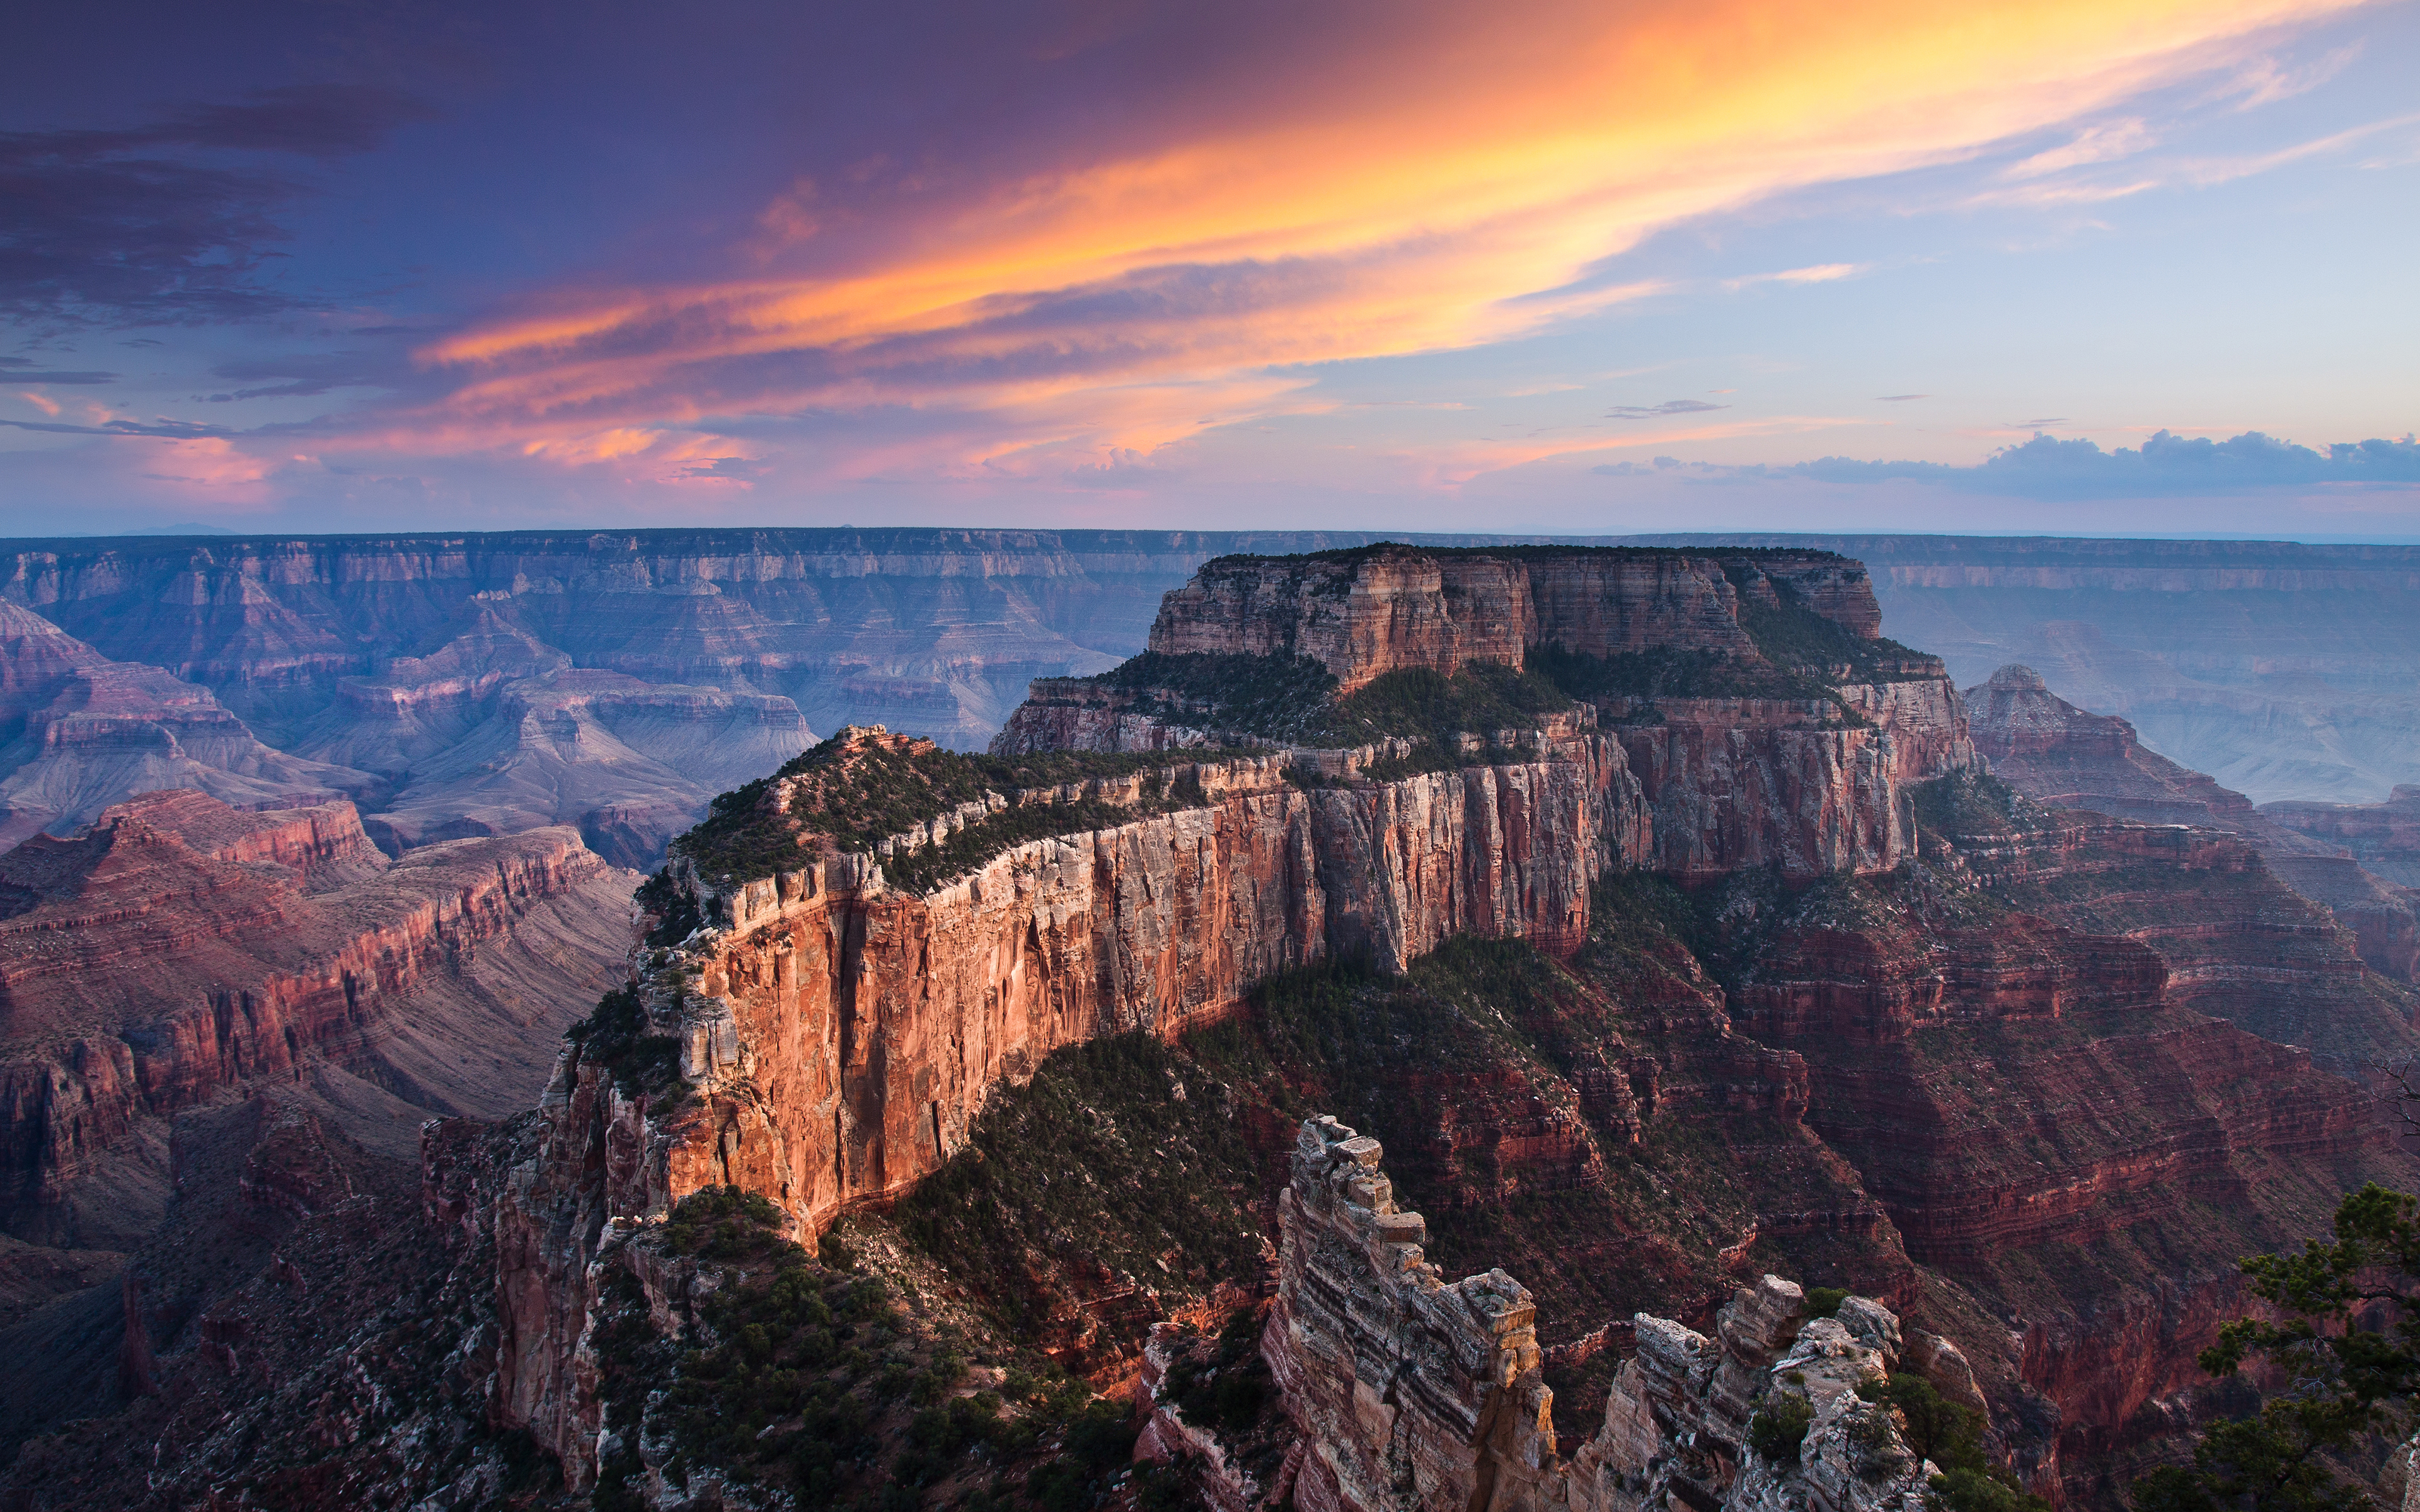 Best 47 Canyon Wallpaper on HipWallpaper Grand Canyon Lightning 3840x2400